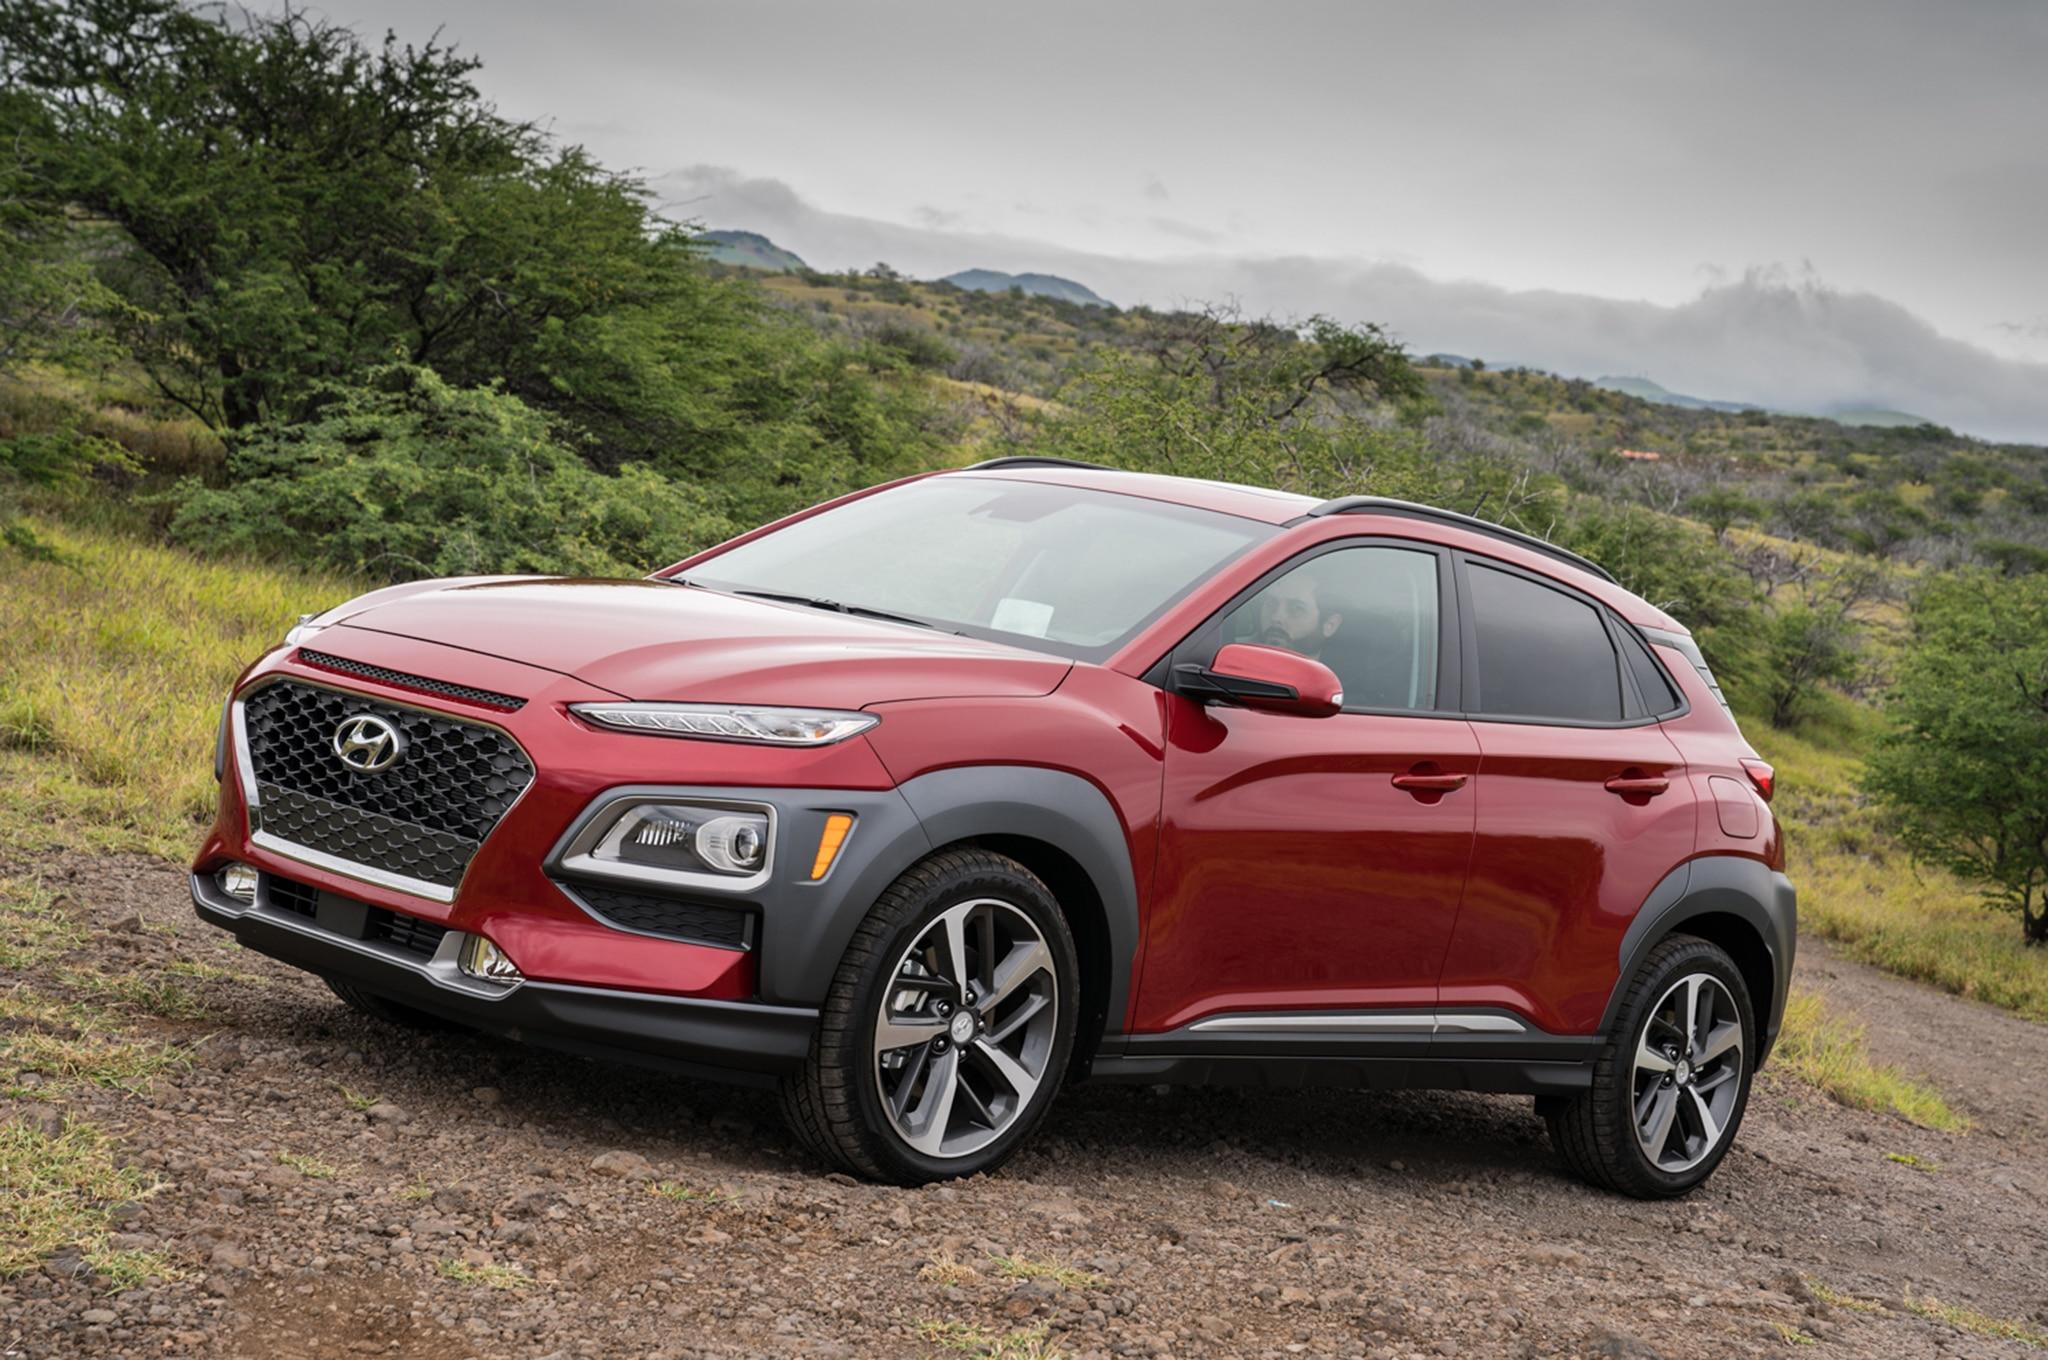 2018 Hyundai Kona First Drive Review | Automobile Magazine